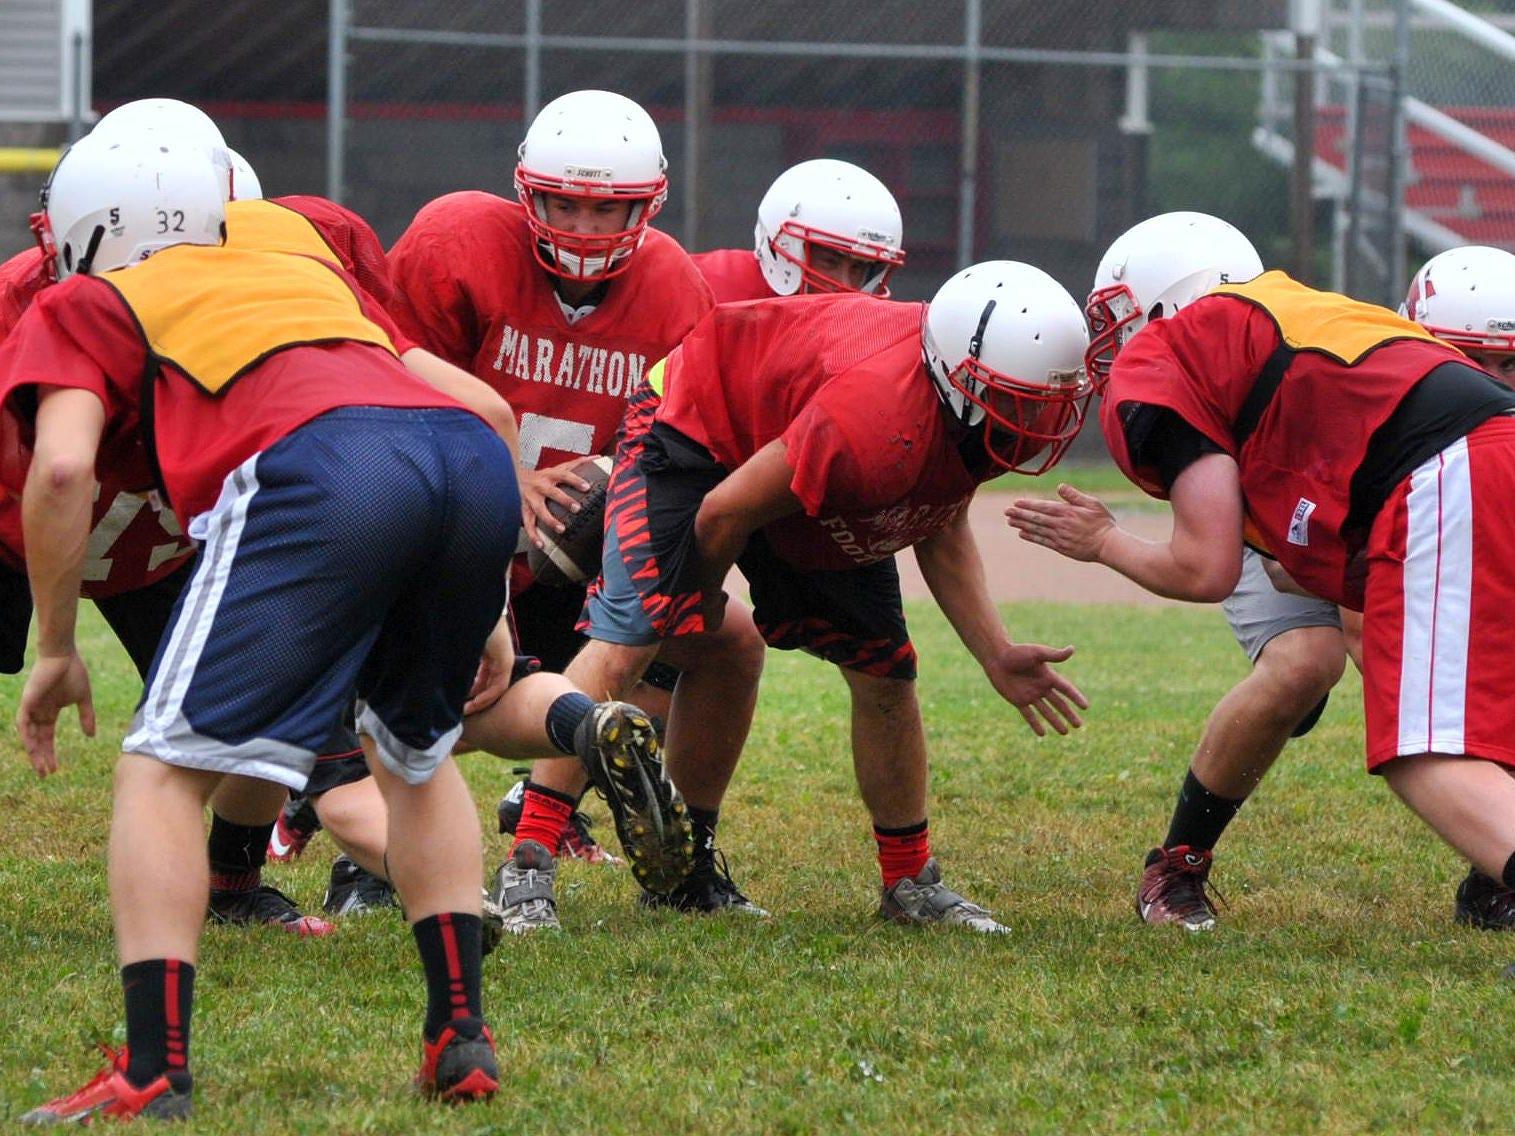 Marathon's football team rehearses drill during Friday football practice at Marathon High School.